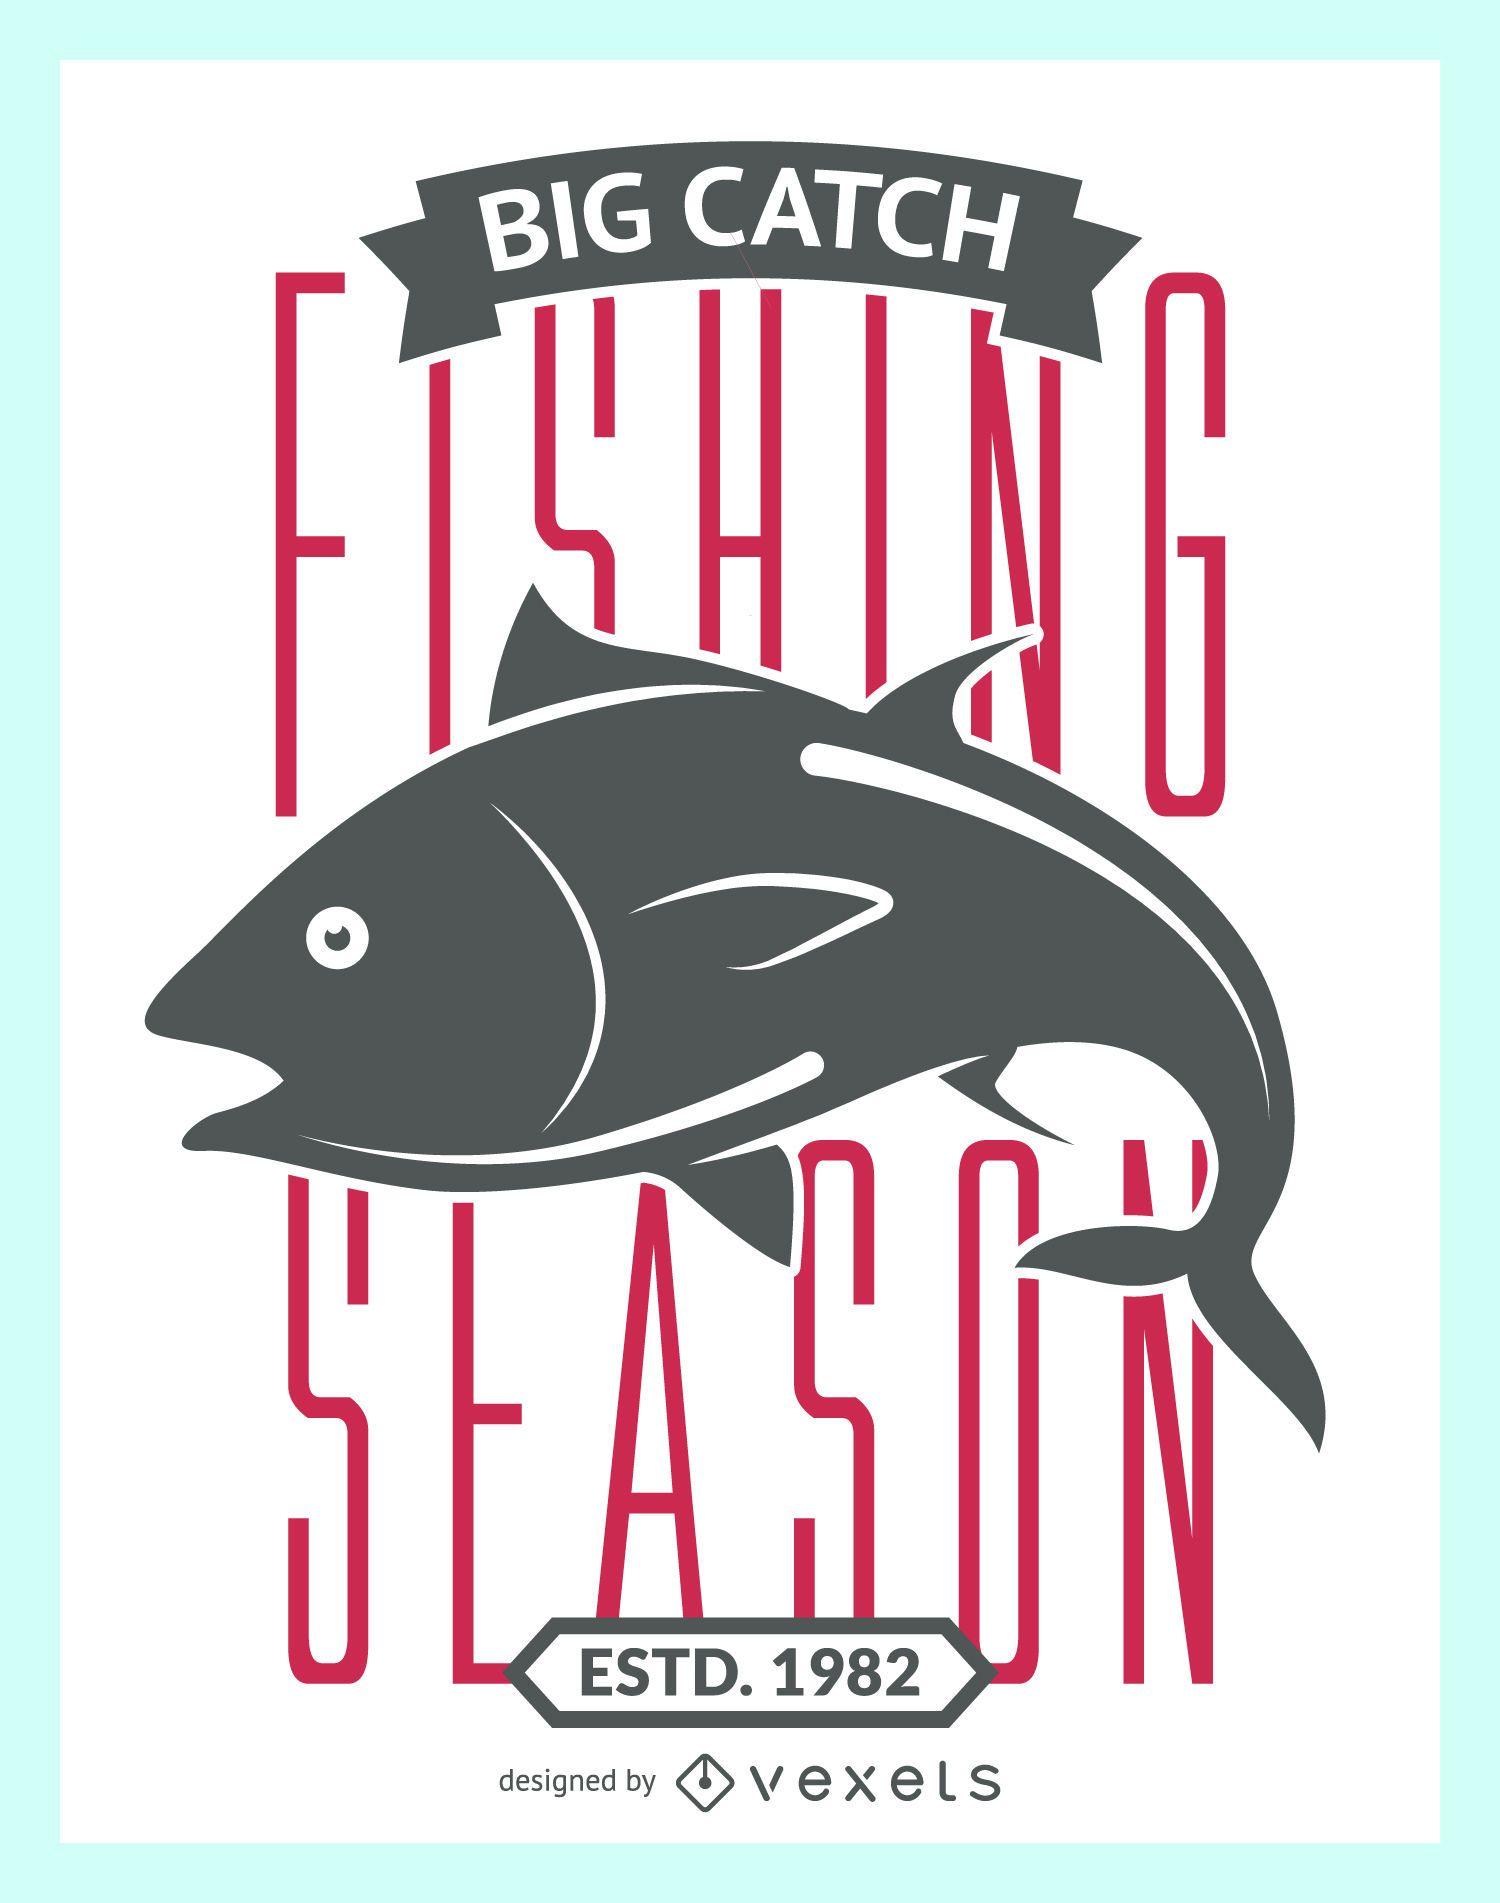 Fishing season vintage label